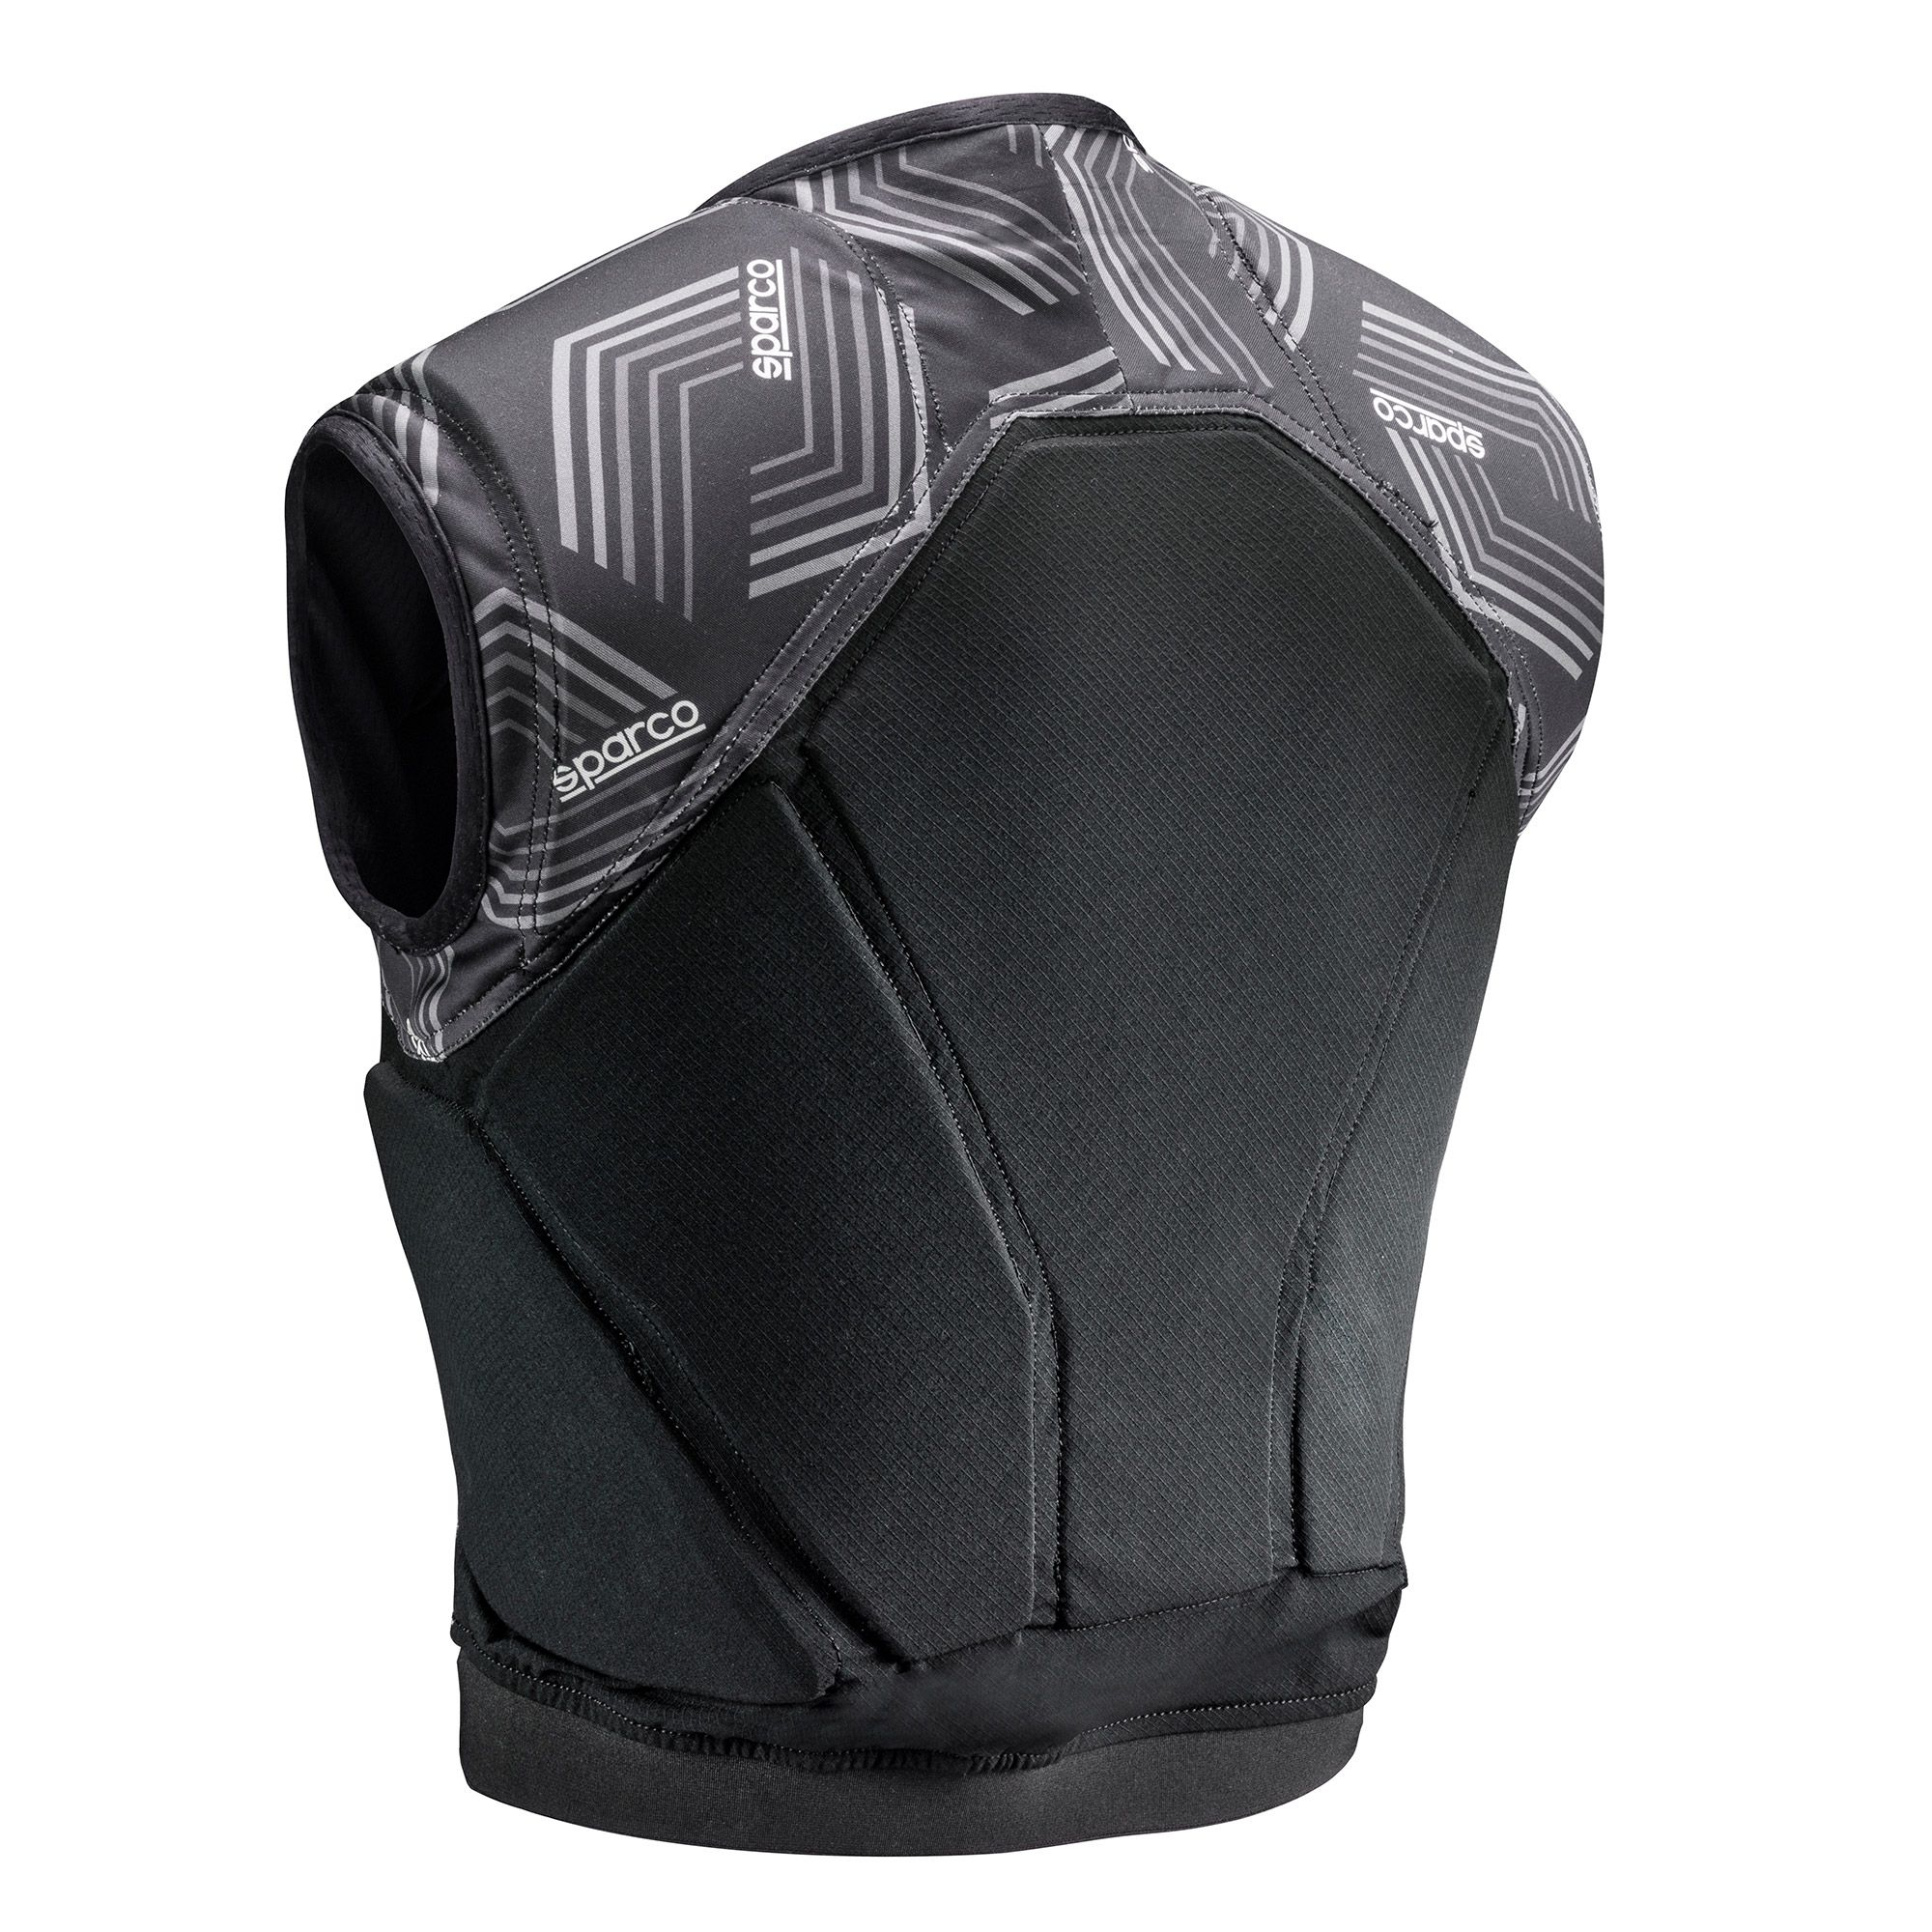 002402K-Sparco-SJ-PRO-K3-Karting-Kart-Protection-Vest-Jacket-Rib-Protector thumbnail 12